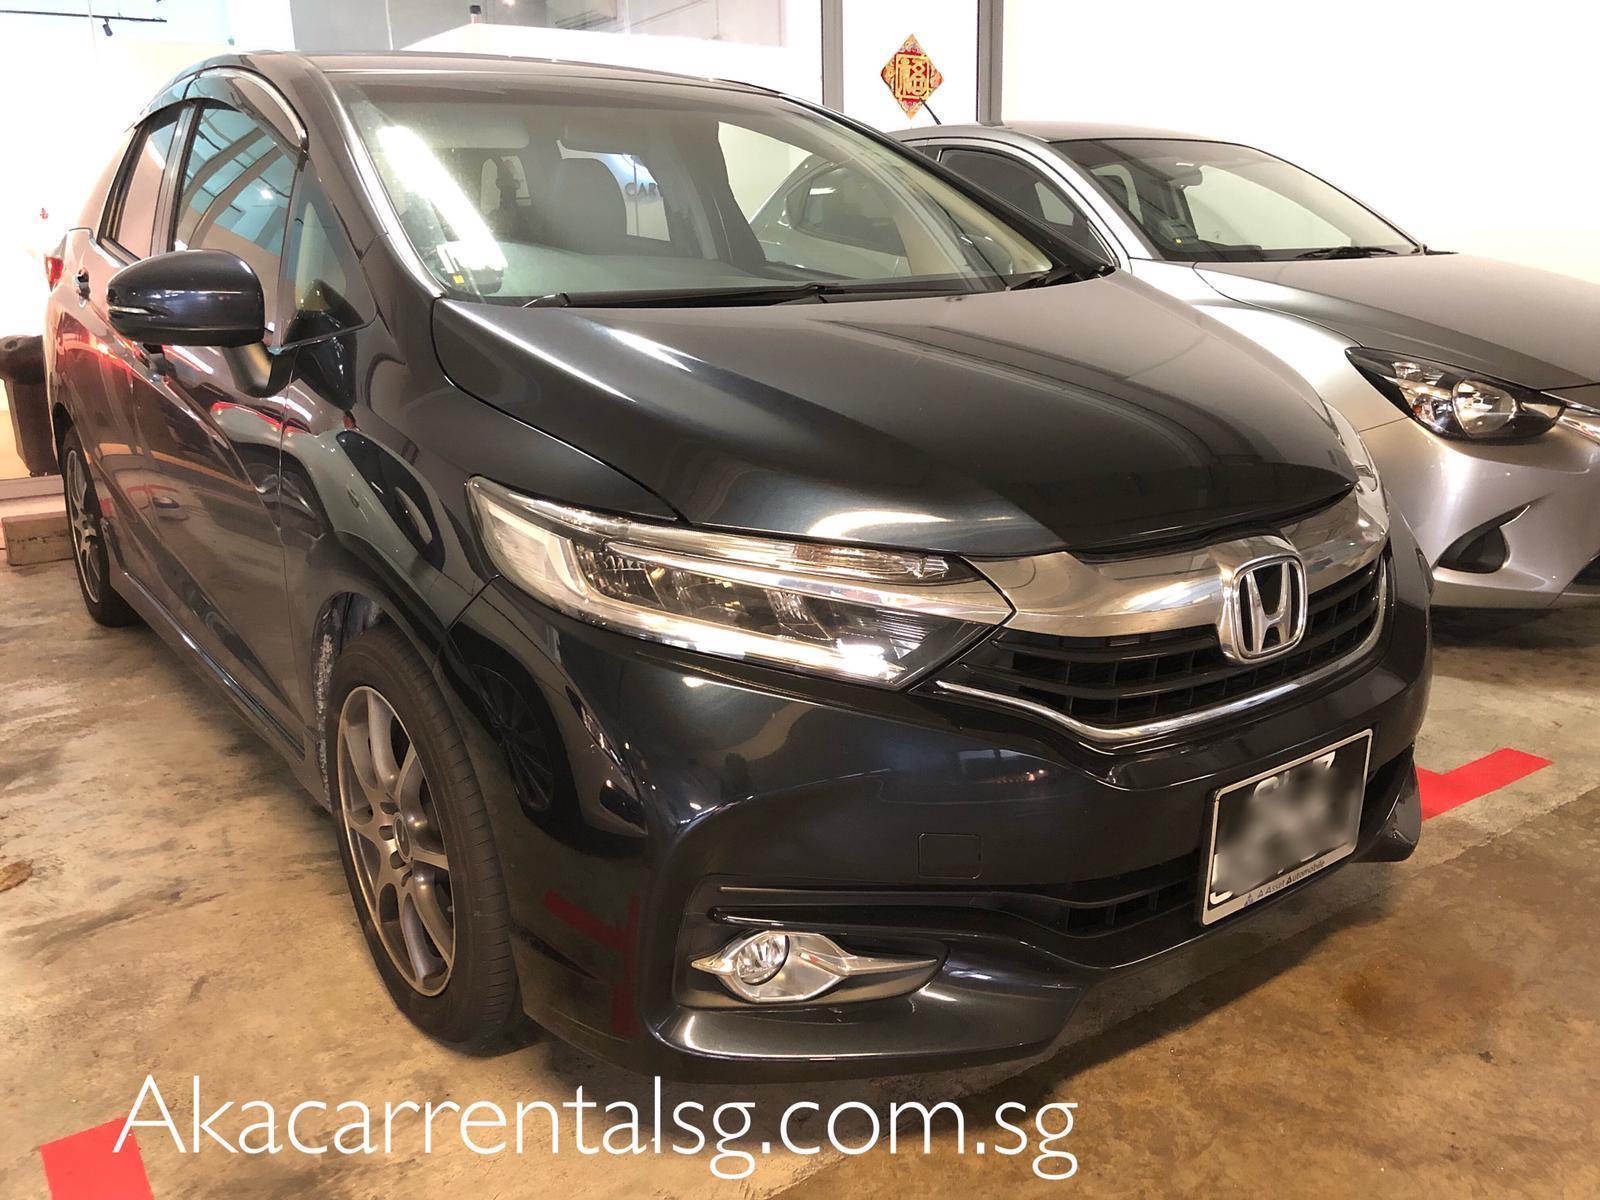 98000933 -- P plate car rental no deposit